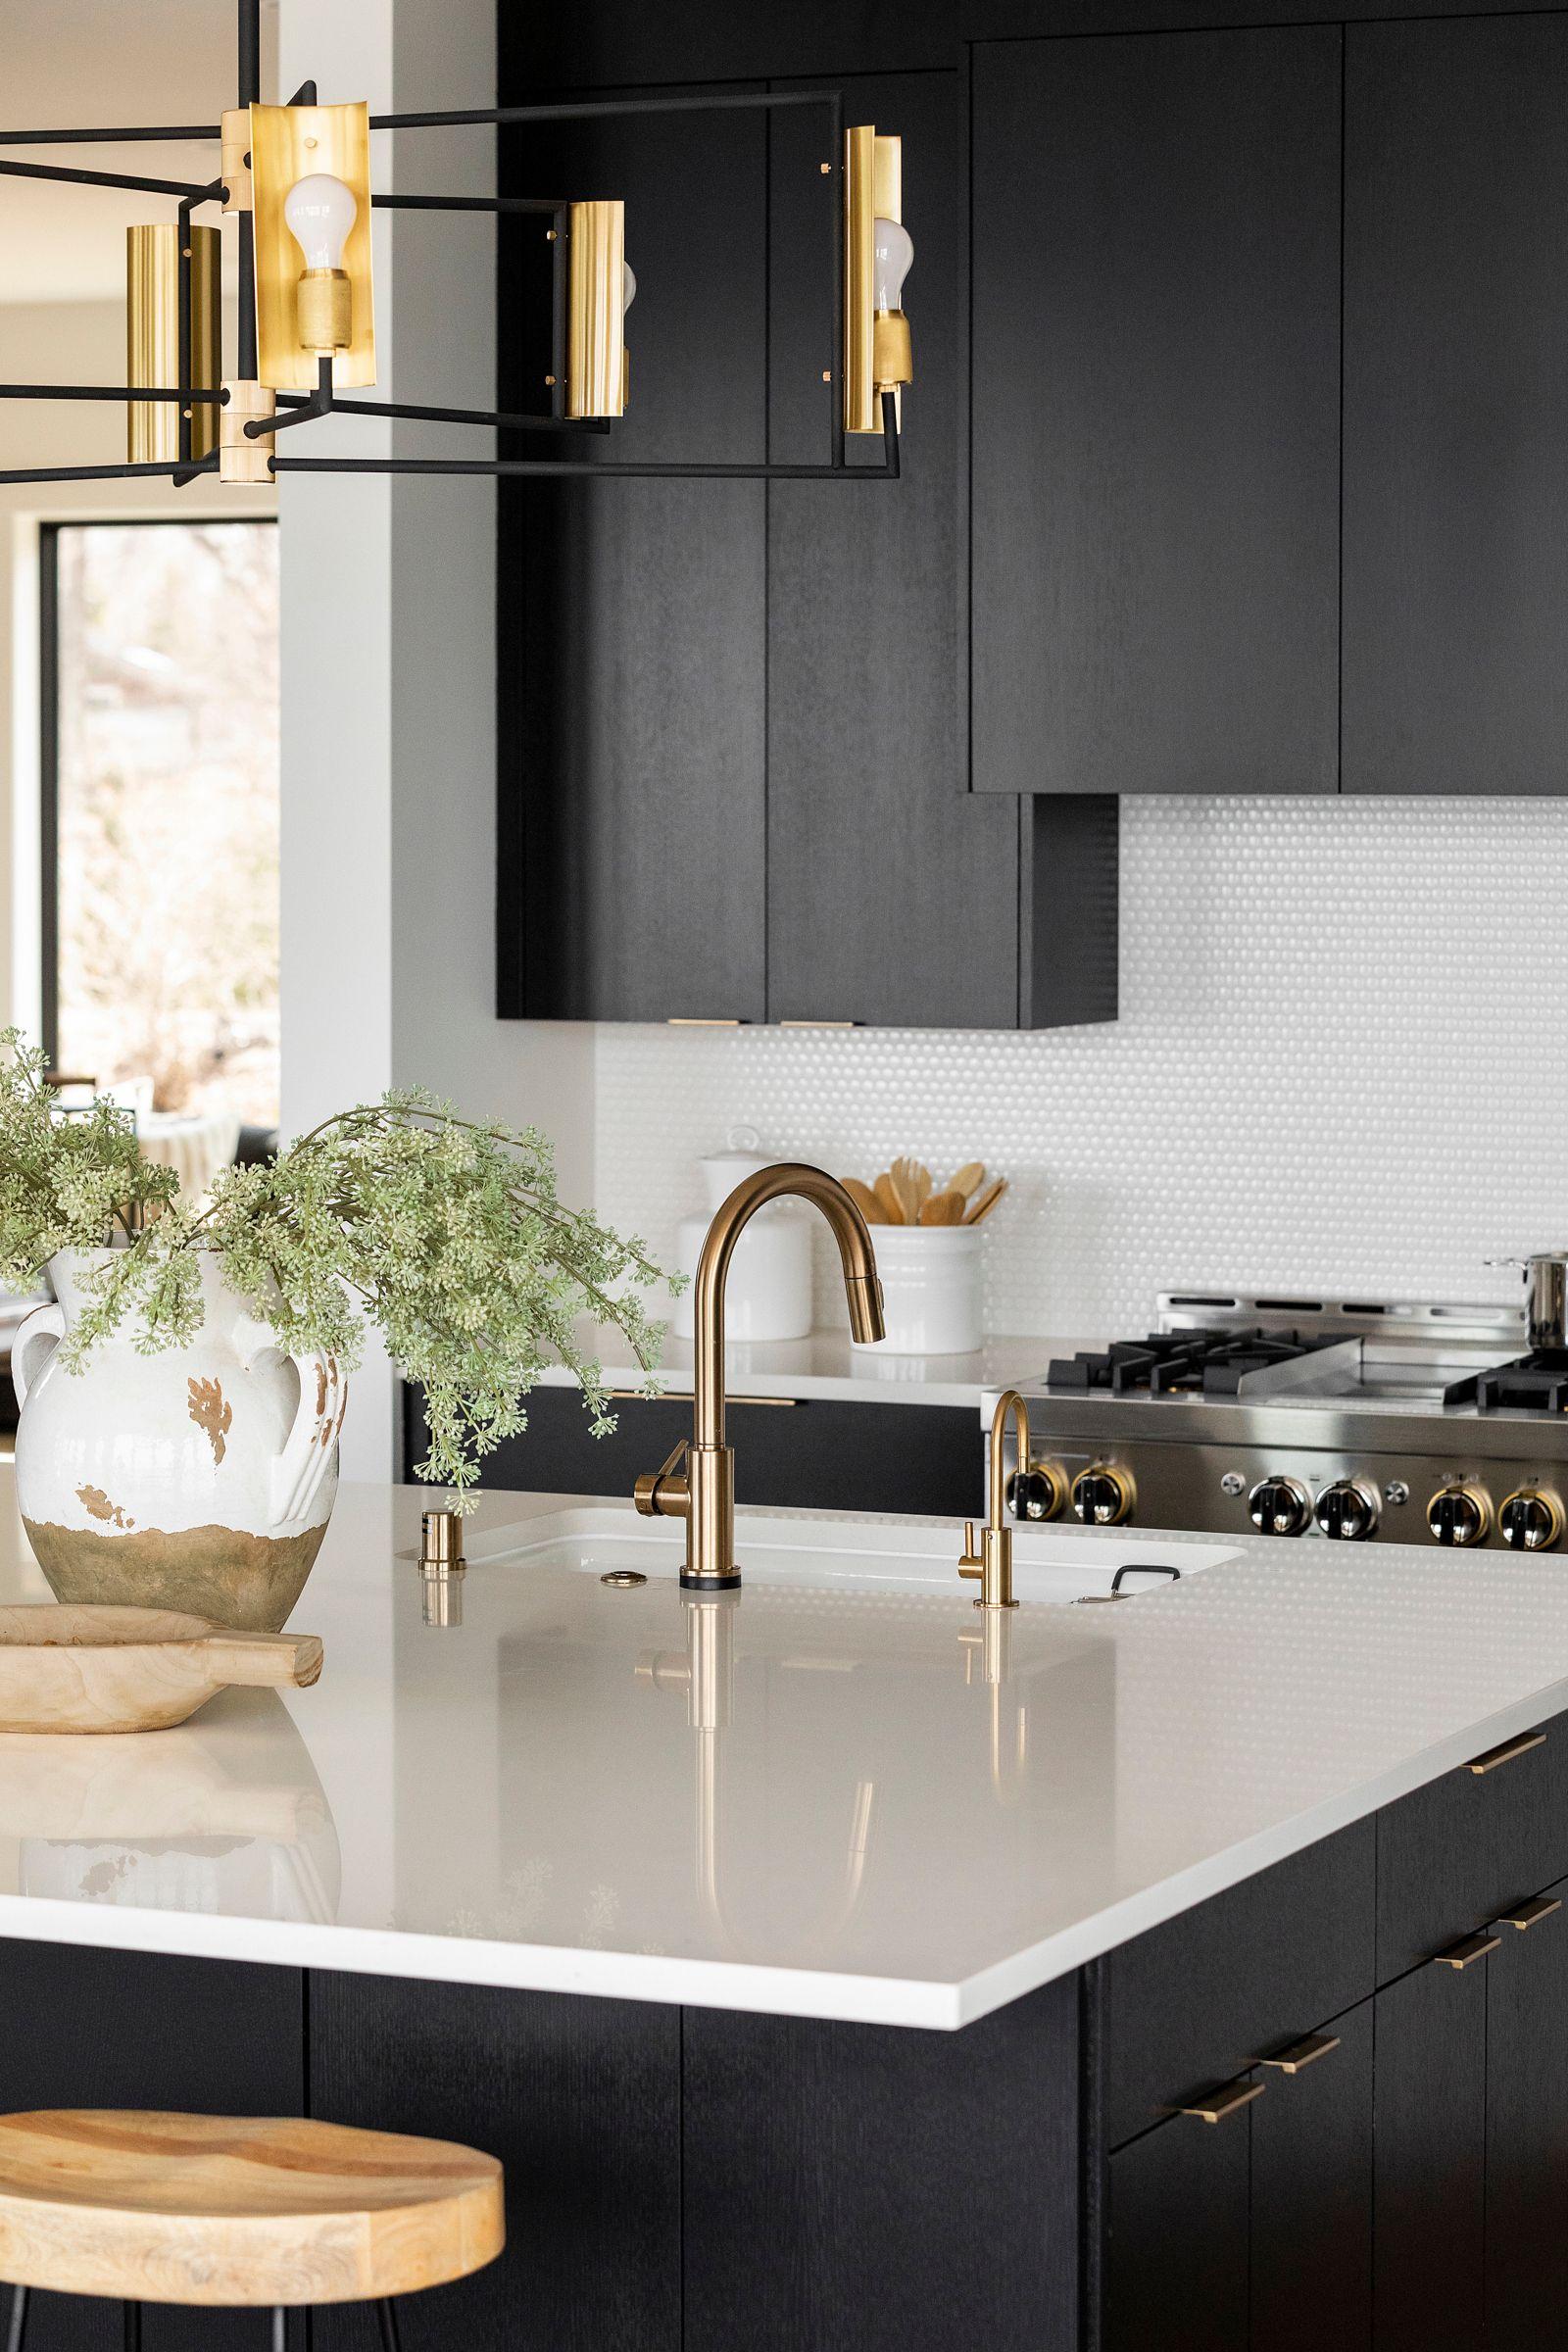 white quartz kitchen island with gold hardware in 2020 stained kitchen cabinets white quartz on kitchen cabinets gold hardware id=61613